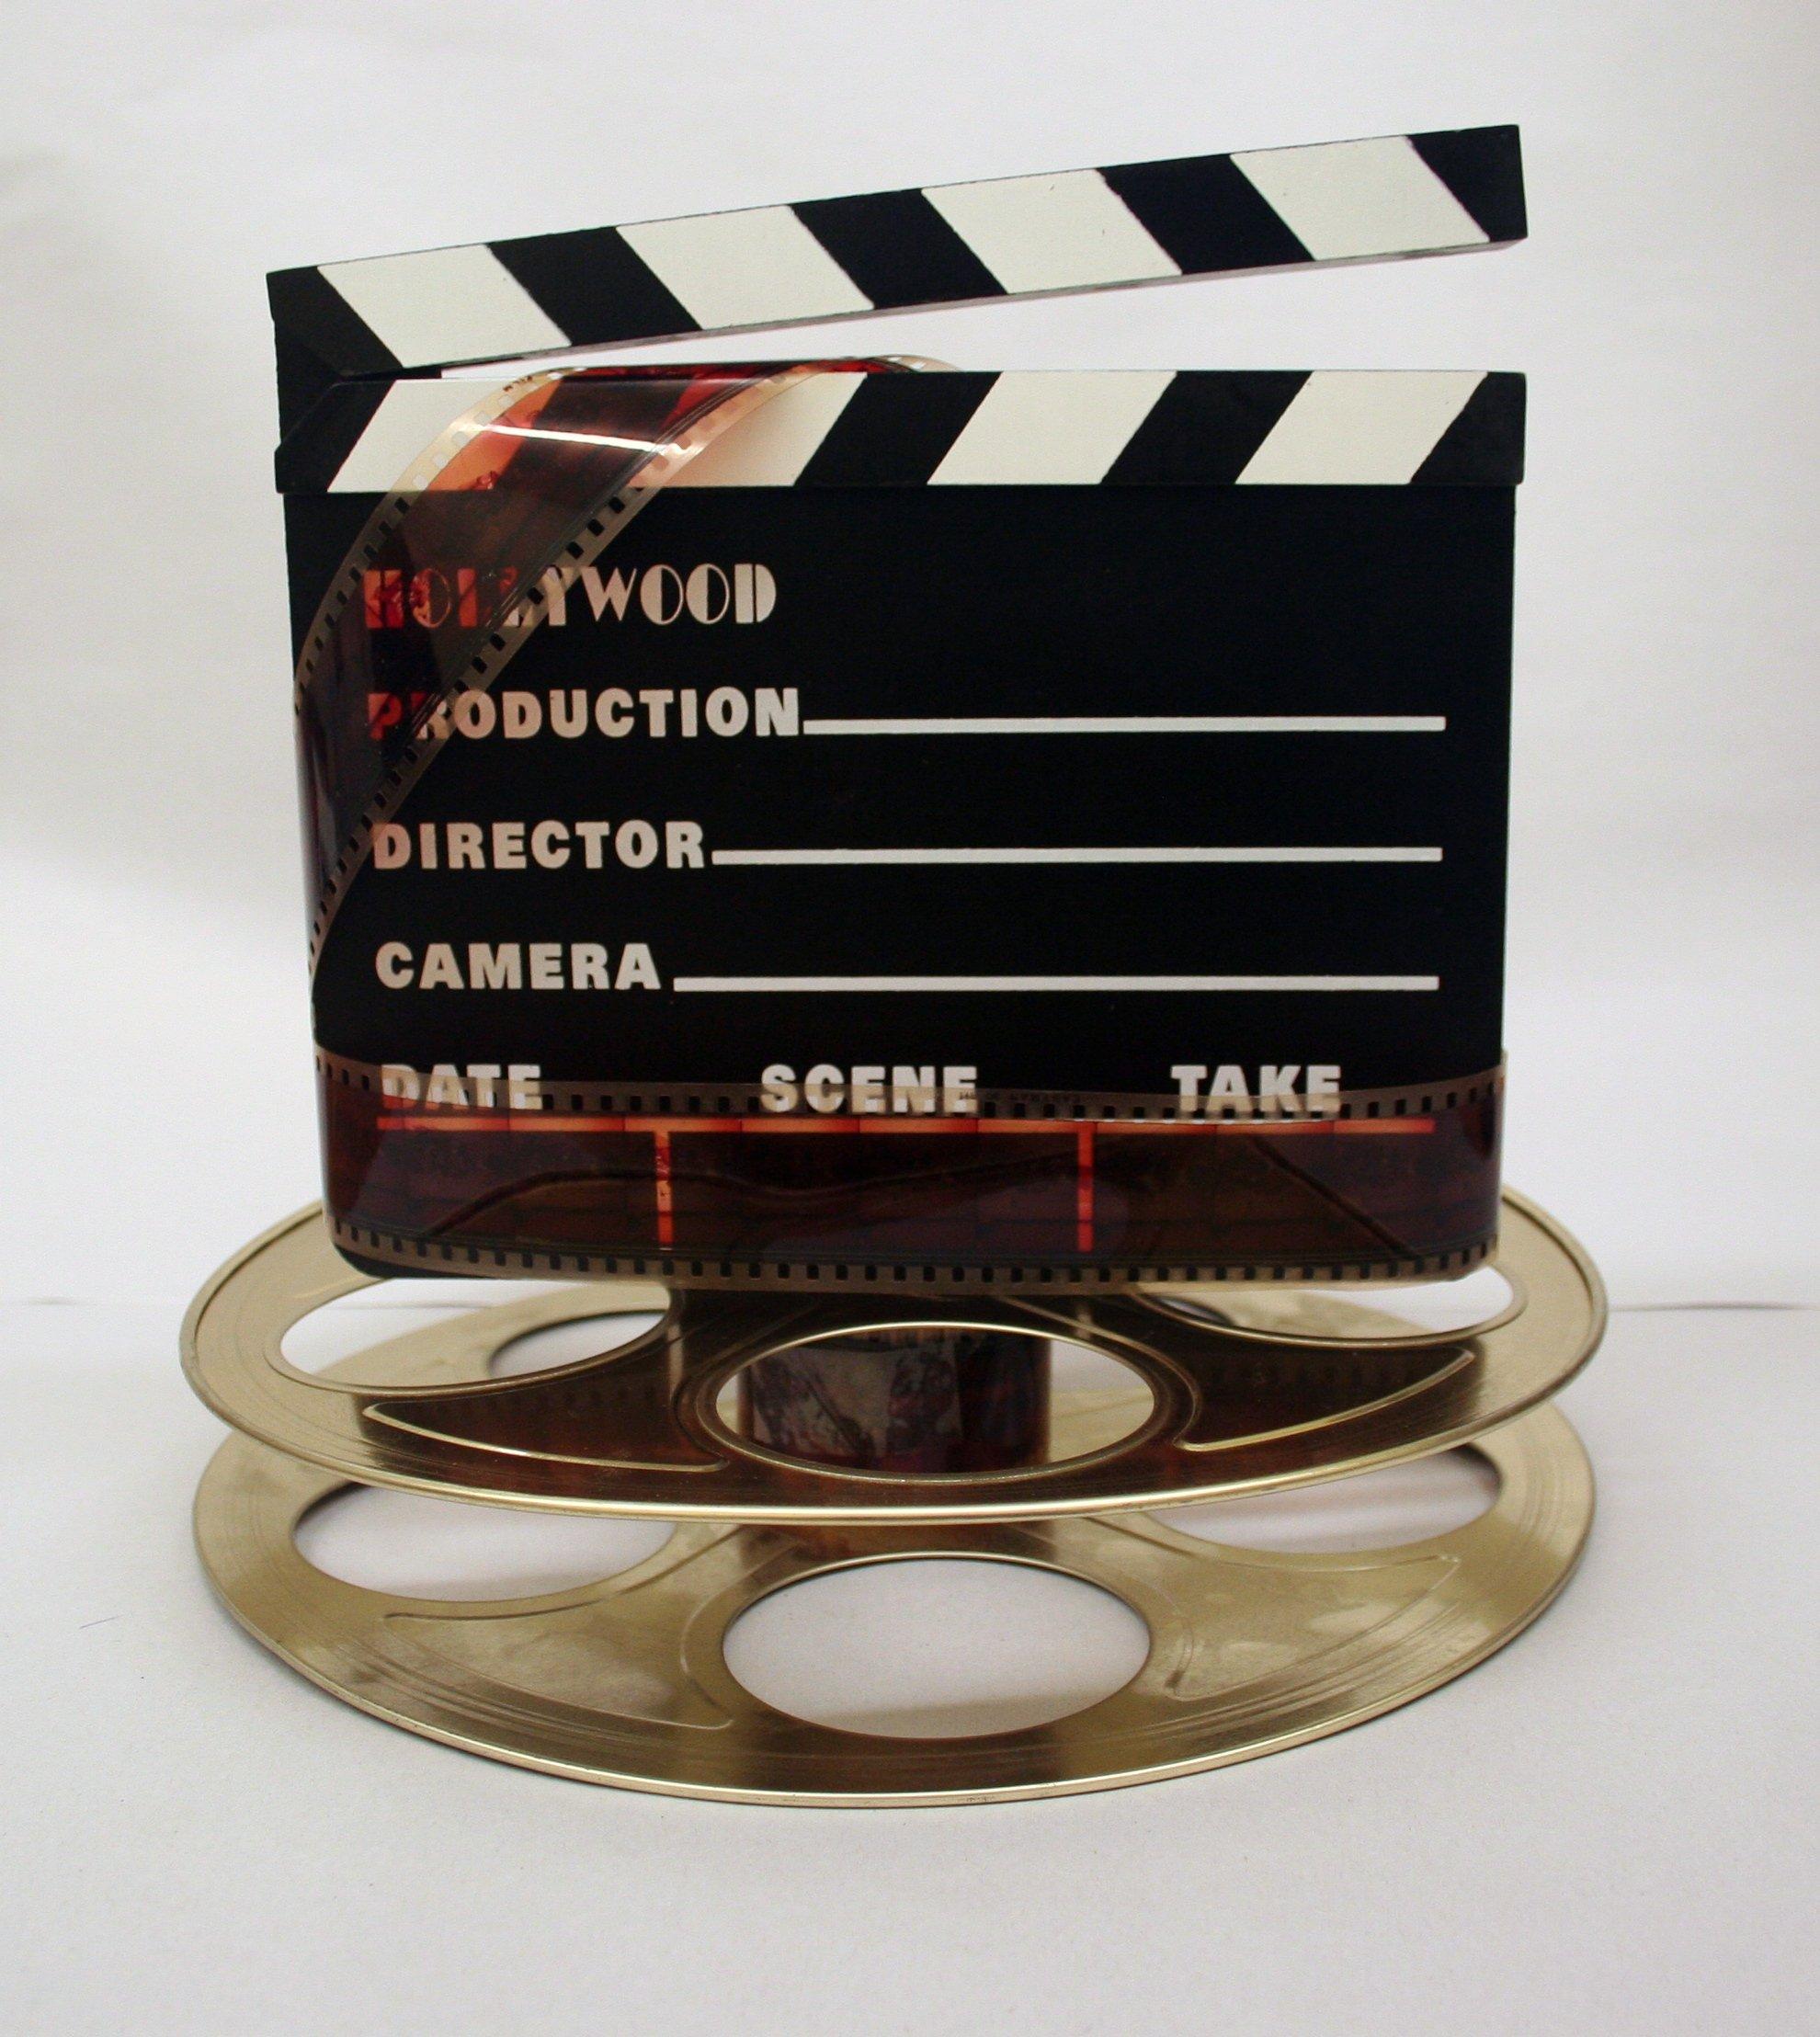 Hollywood Studio Clapboard & Reel Centerpiece - Gold